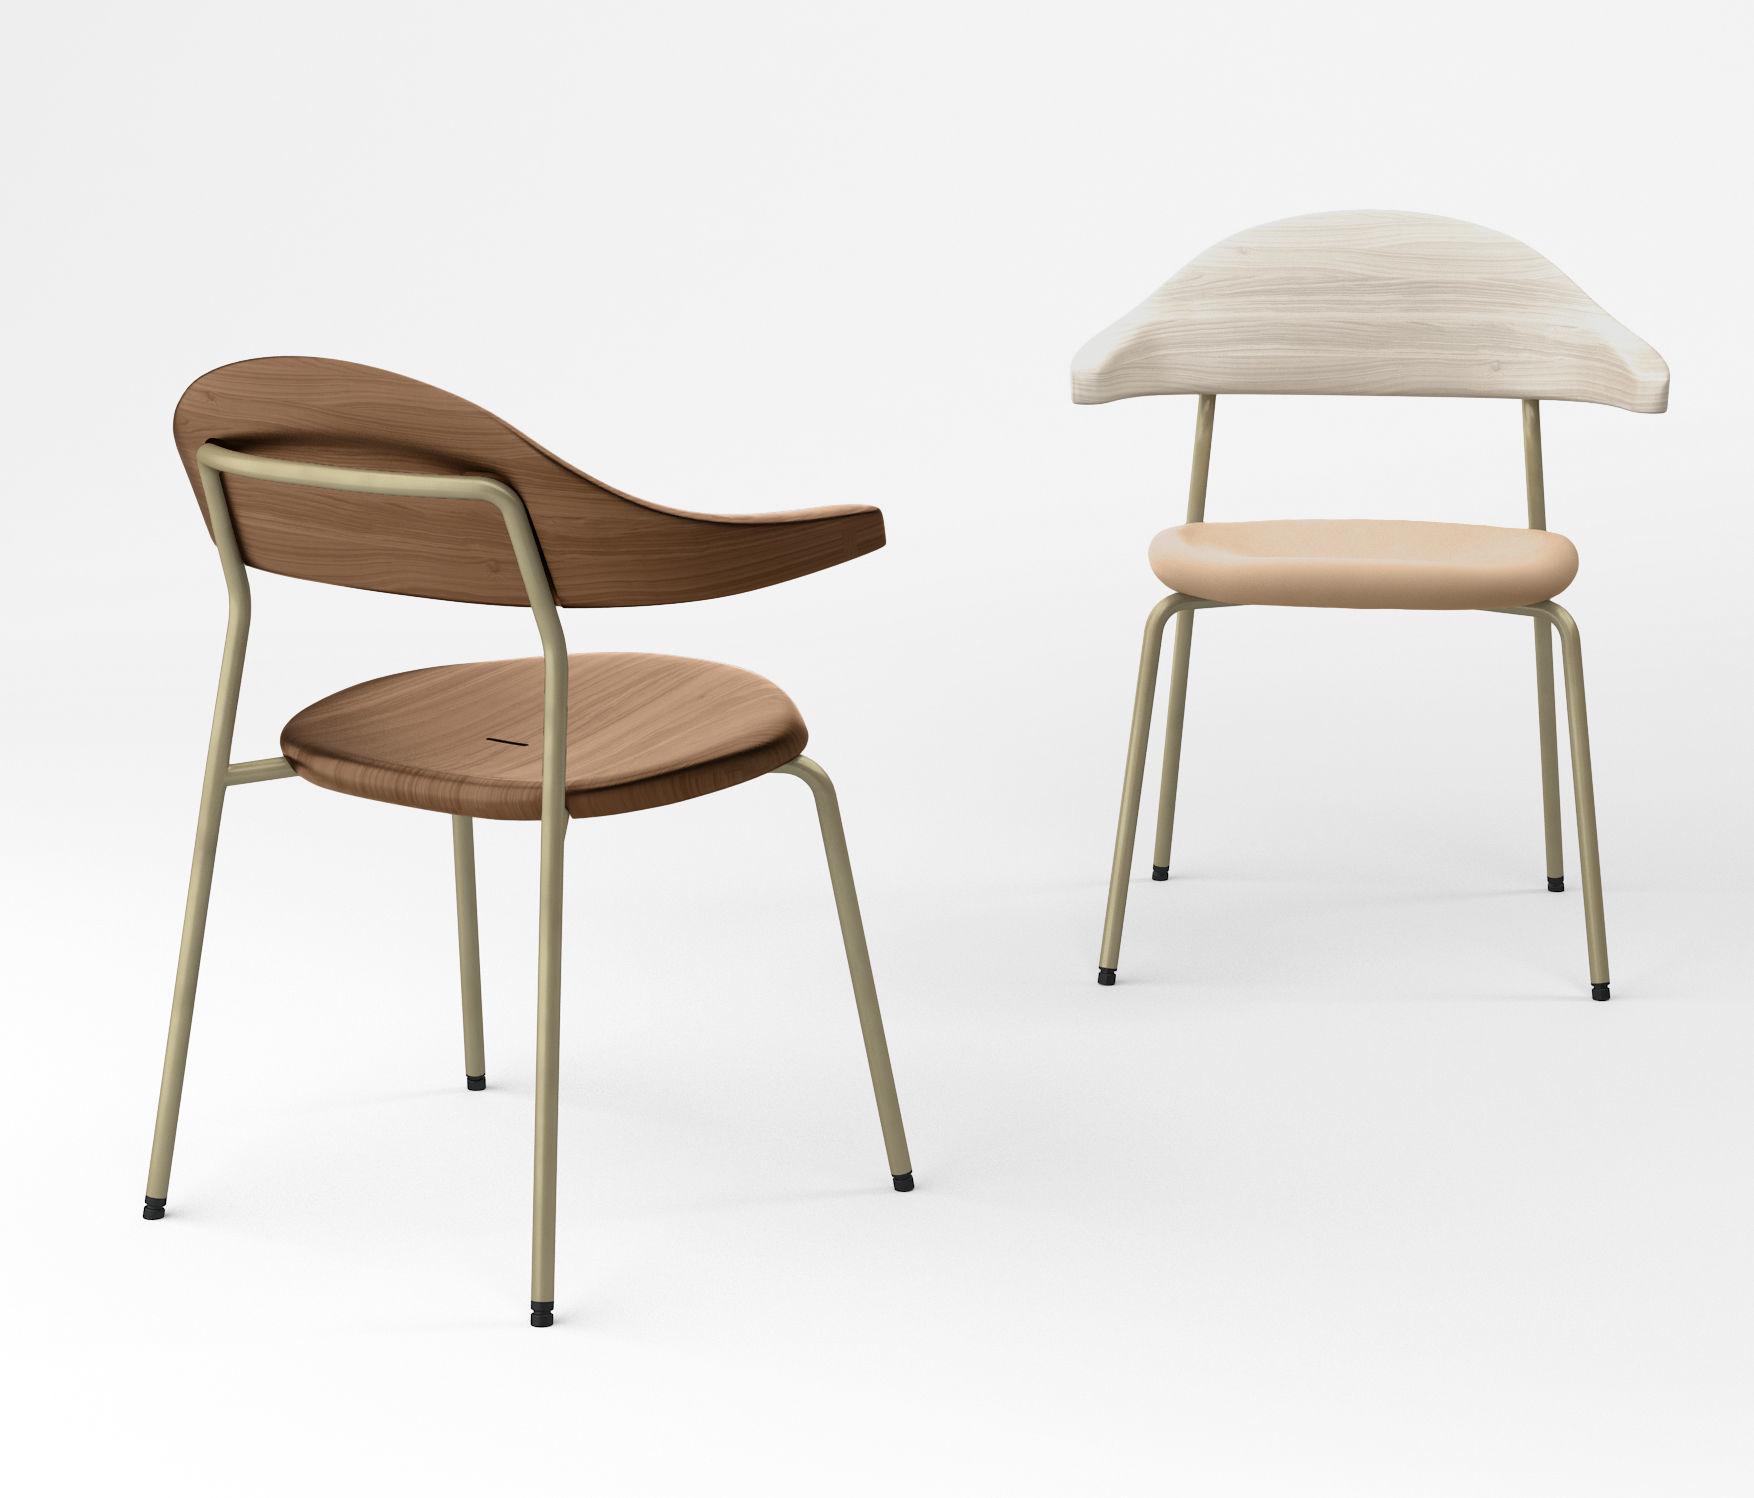 Bassam Fellows Bicorn side chair